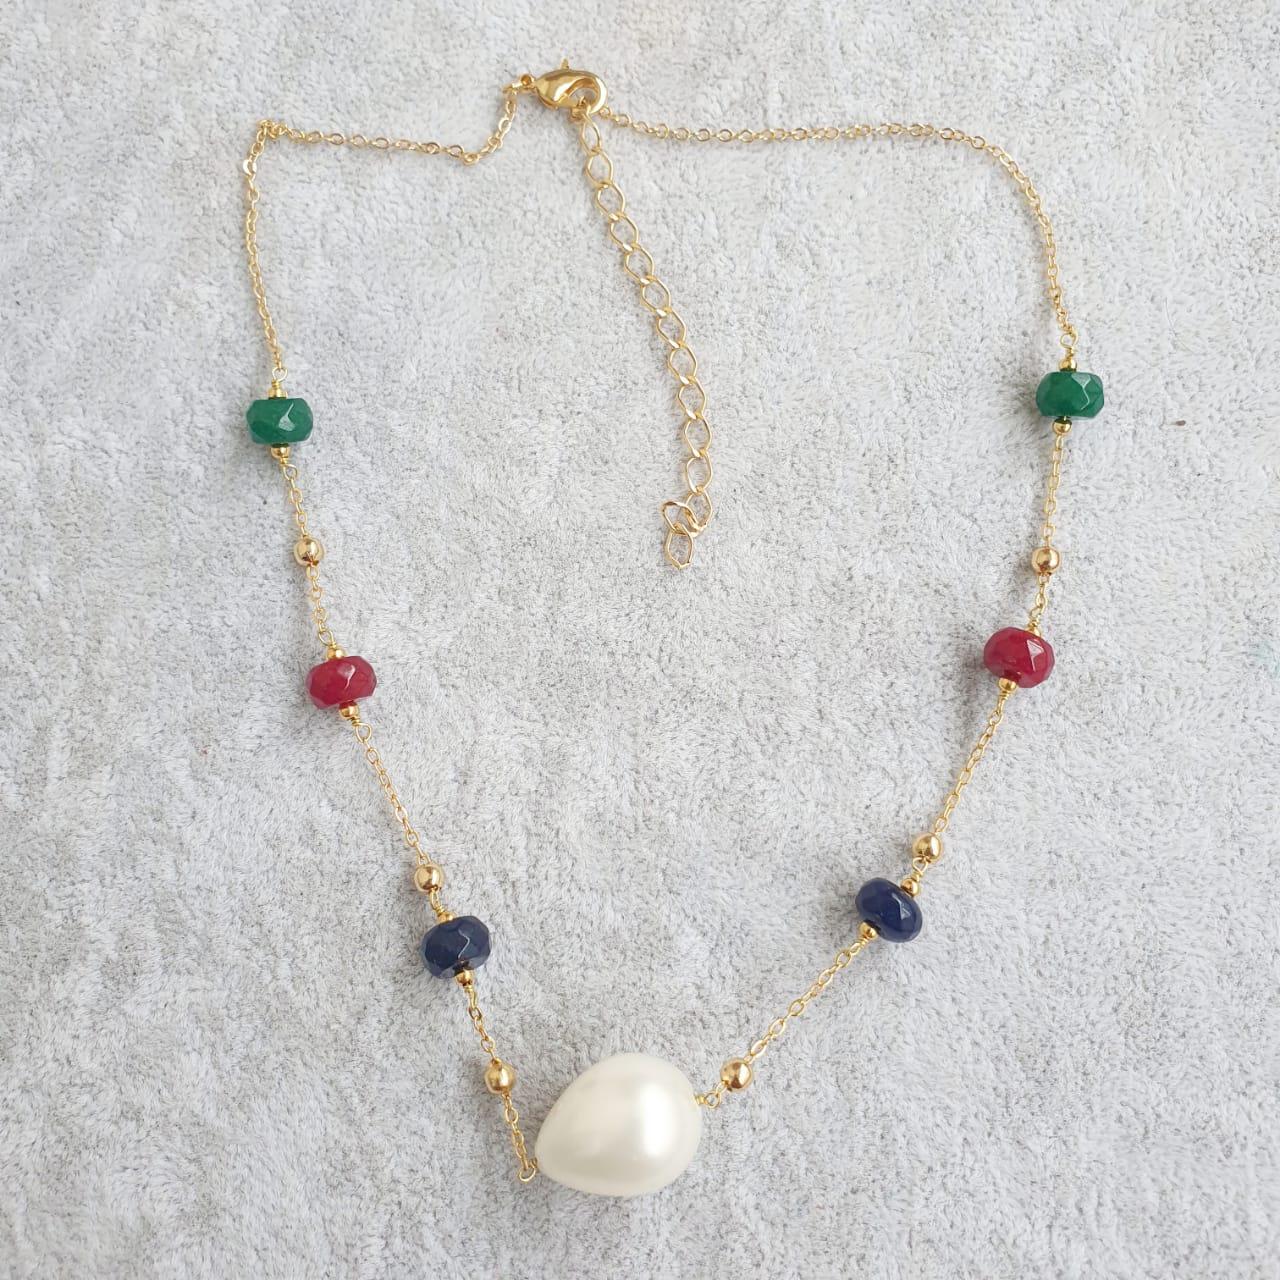 Colar semijoia safira rubi esmeralda perola gota 1618